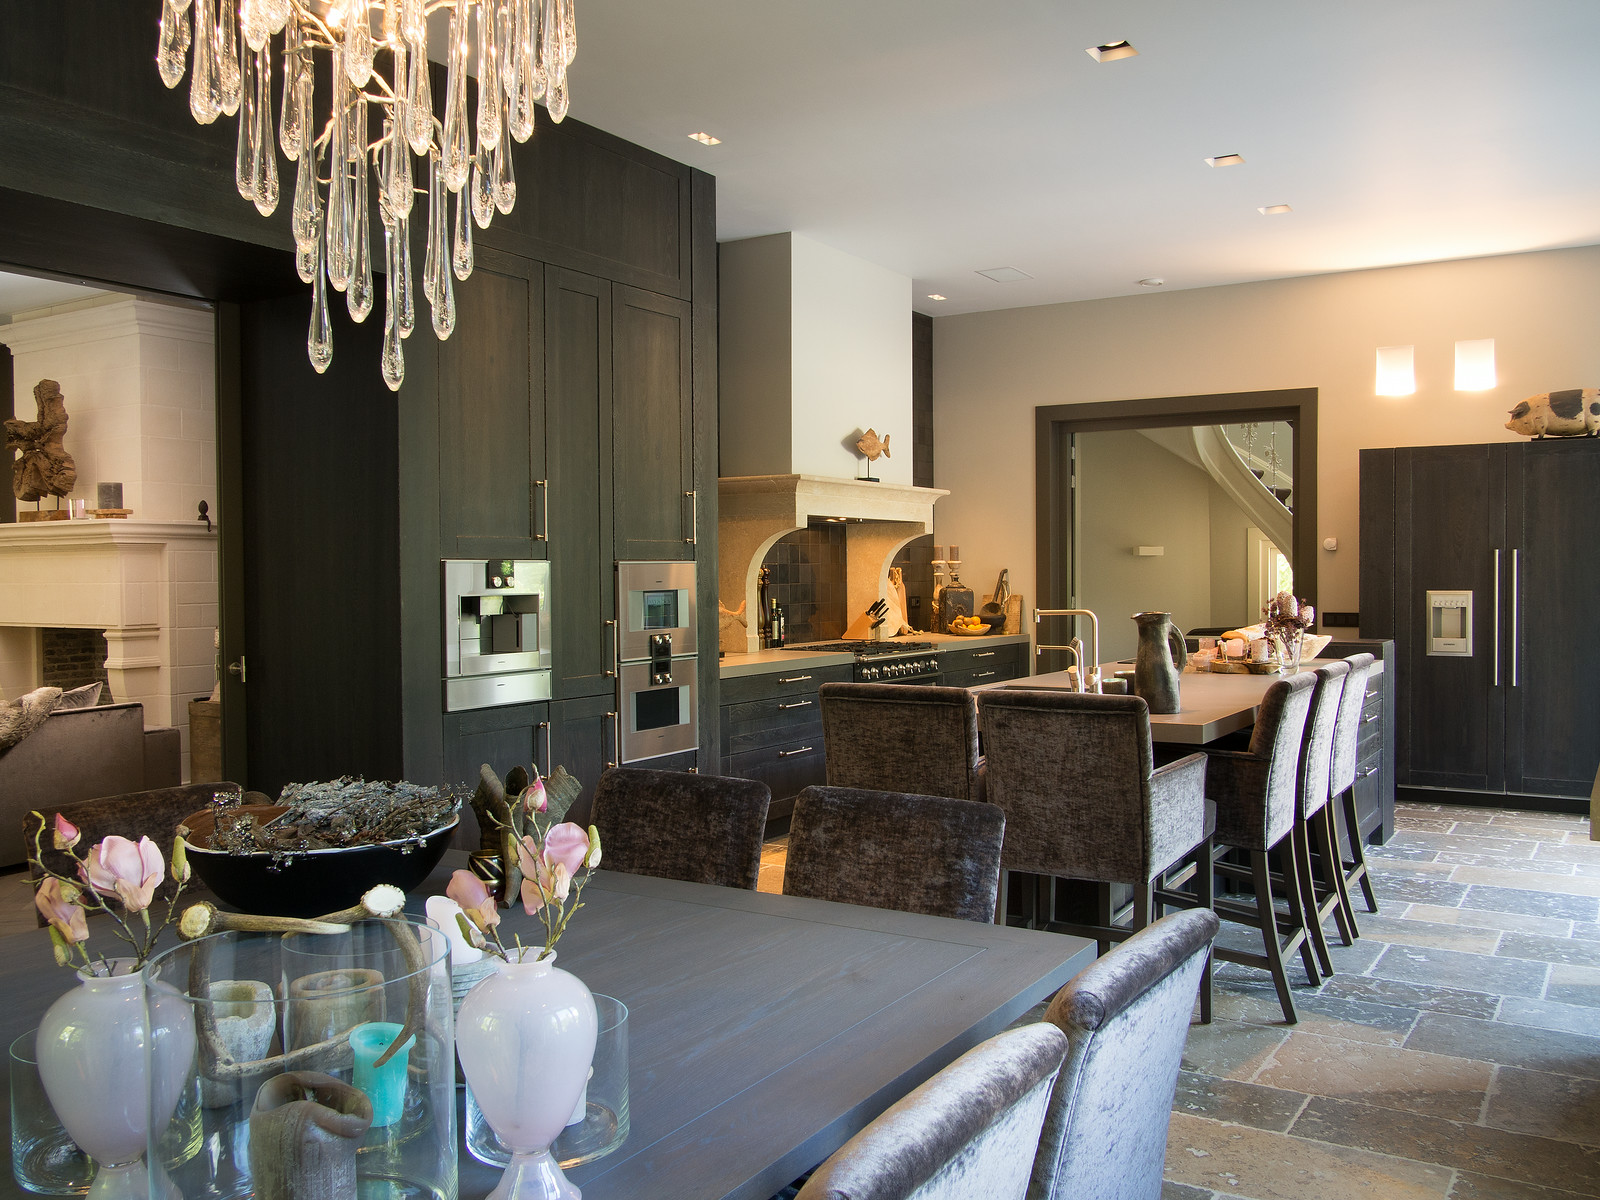 Donkere Keuken Lichte Vloer : Tieleman Keukens in MIDDELHARNIS Startpagina voor keuken